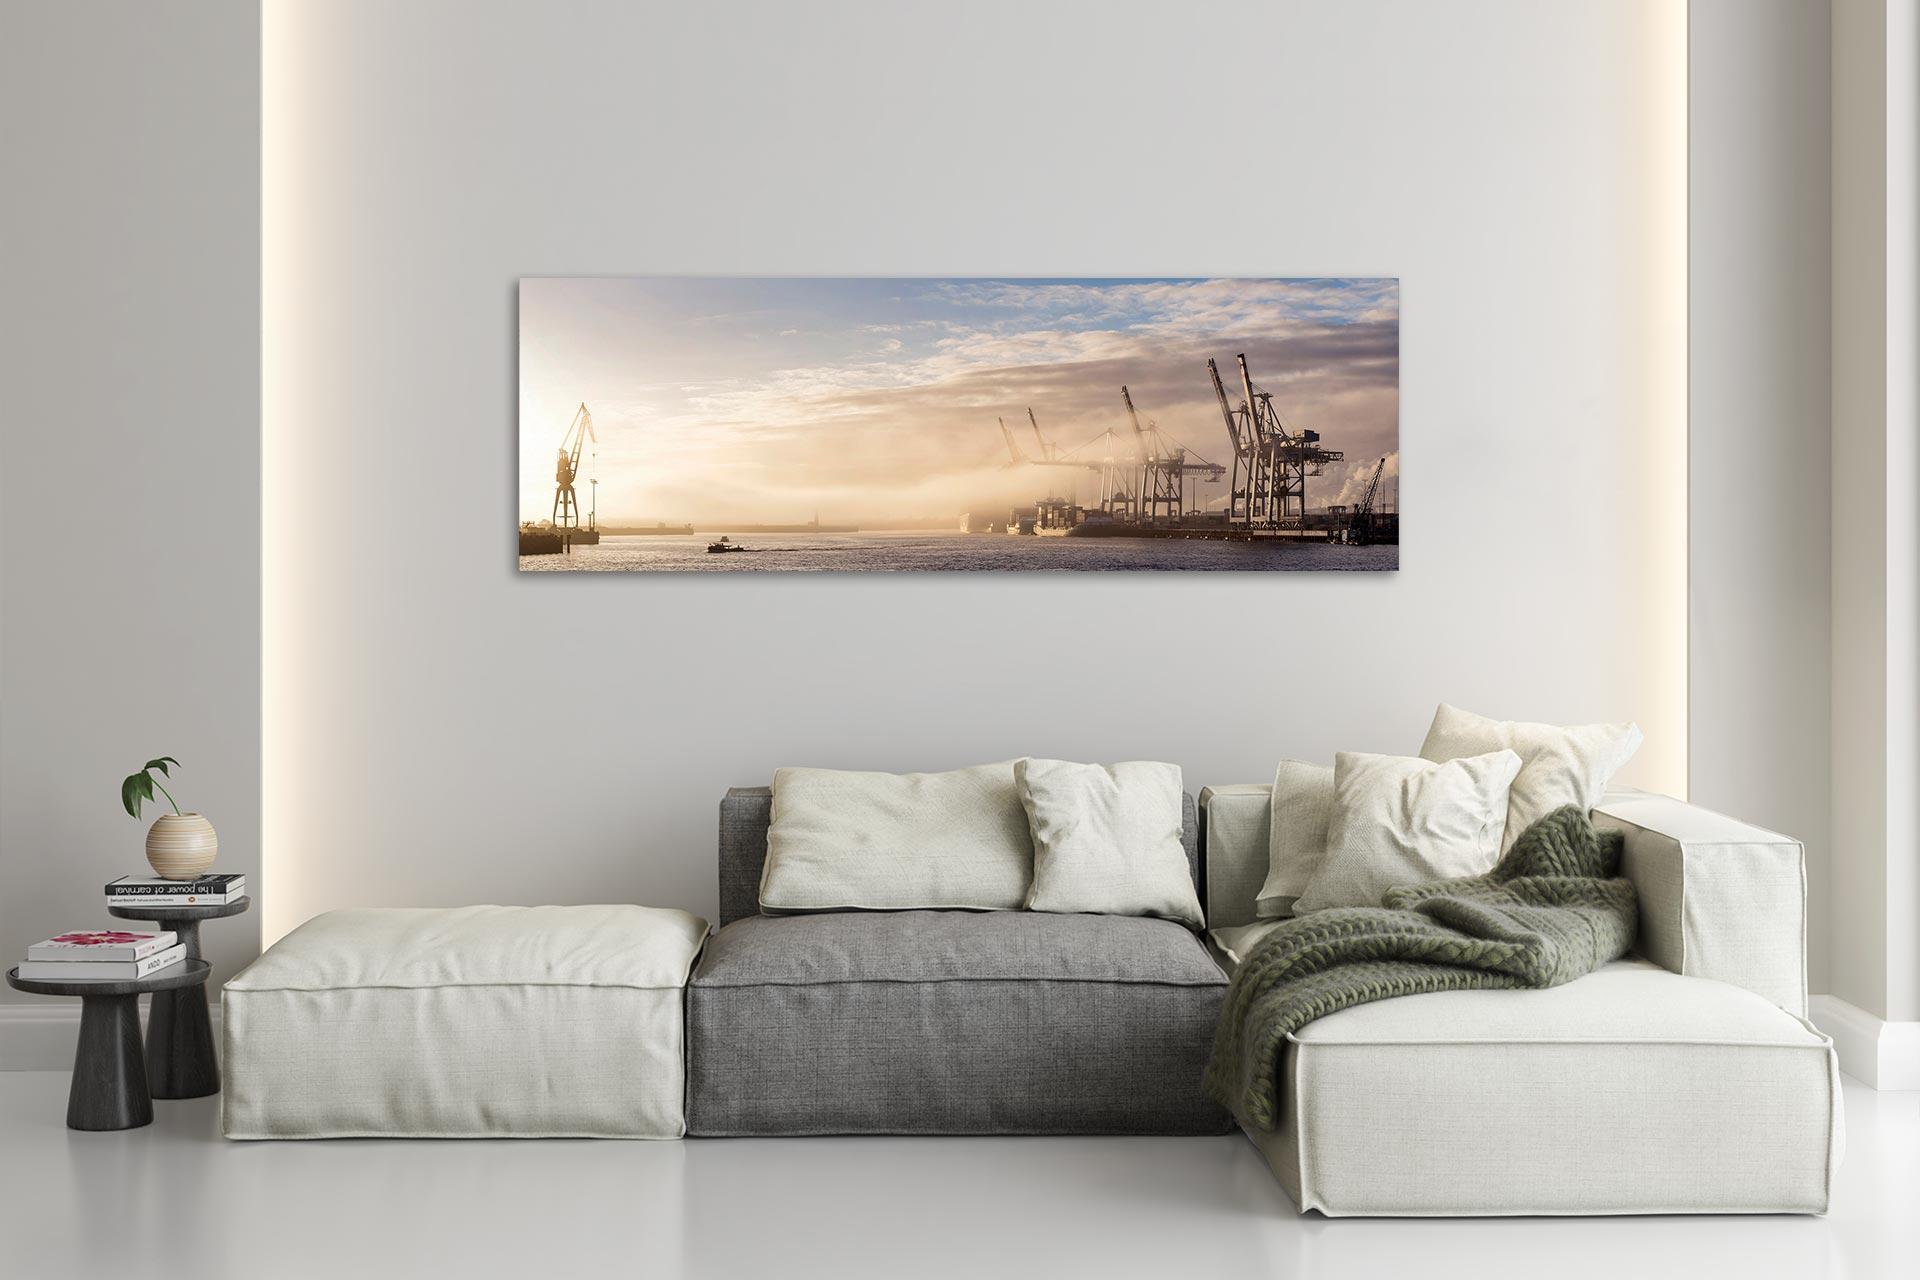 PSW101-panorama-hafen-leinwand-acrylglas-aludibond-wohnzimmer